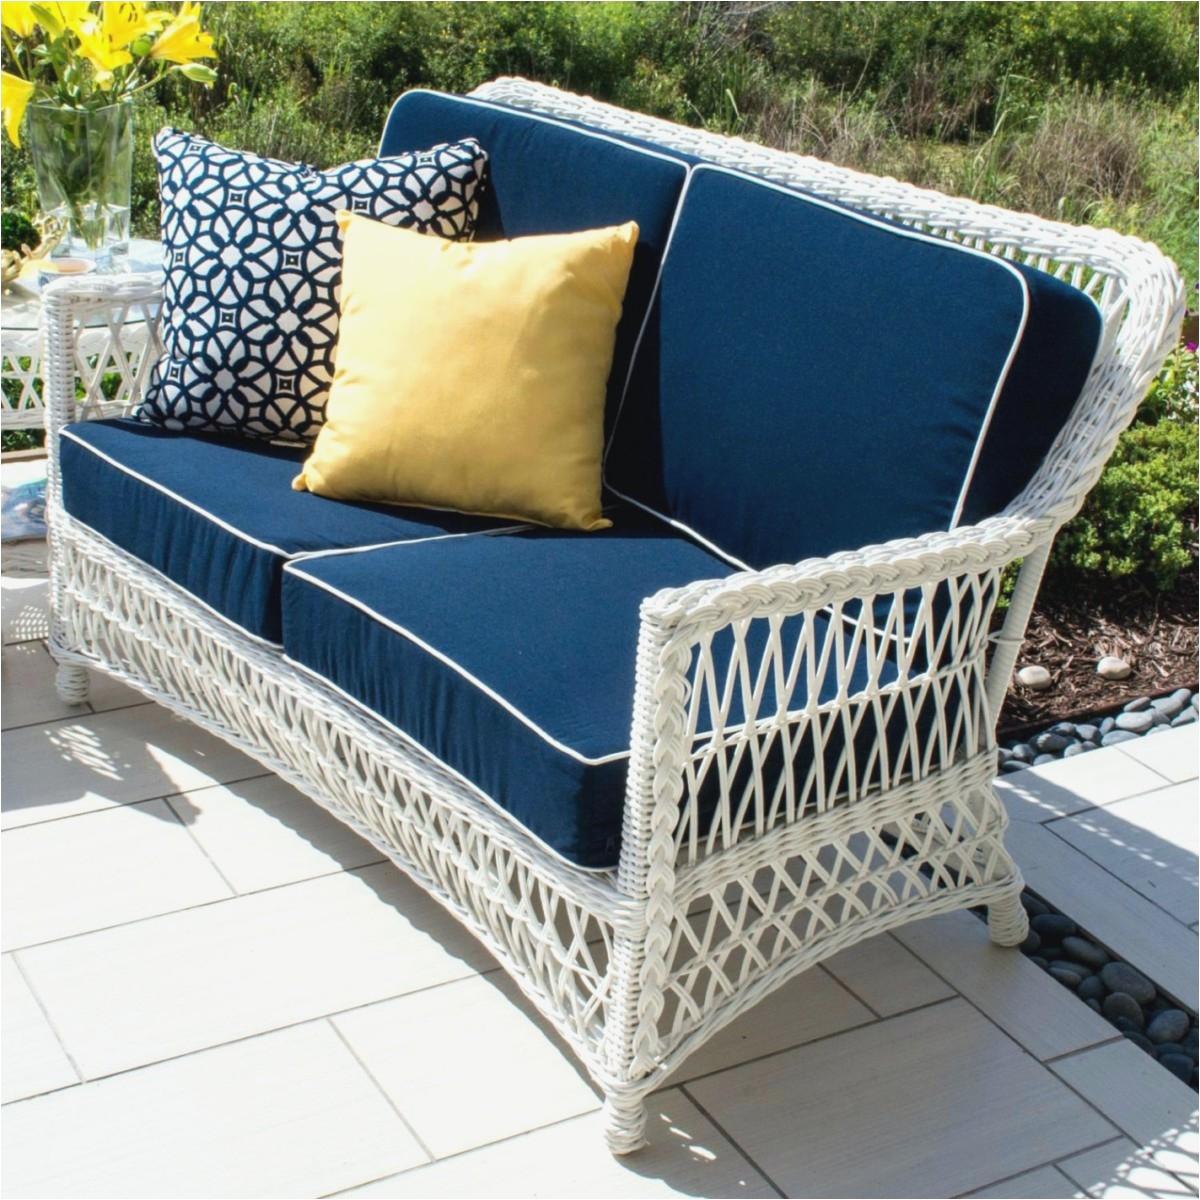 Plastic Porch Chairs Walmart Pvc Adirondack Chairs Photos Plastic Patio Set New Luxurios Wicker